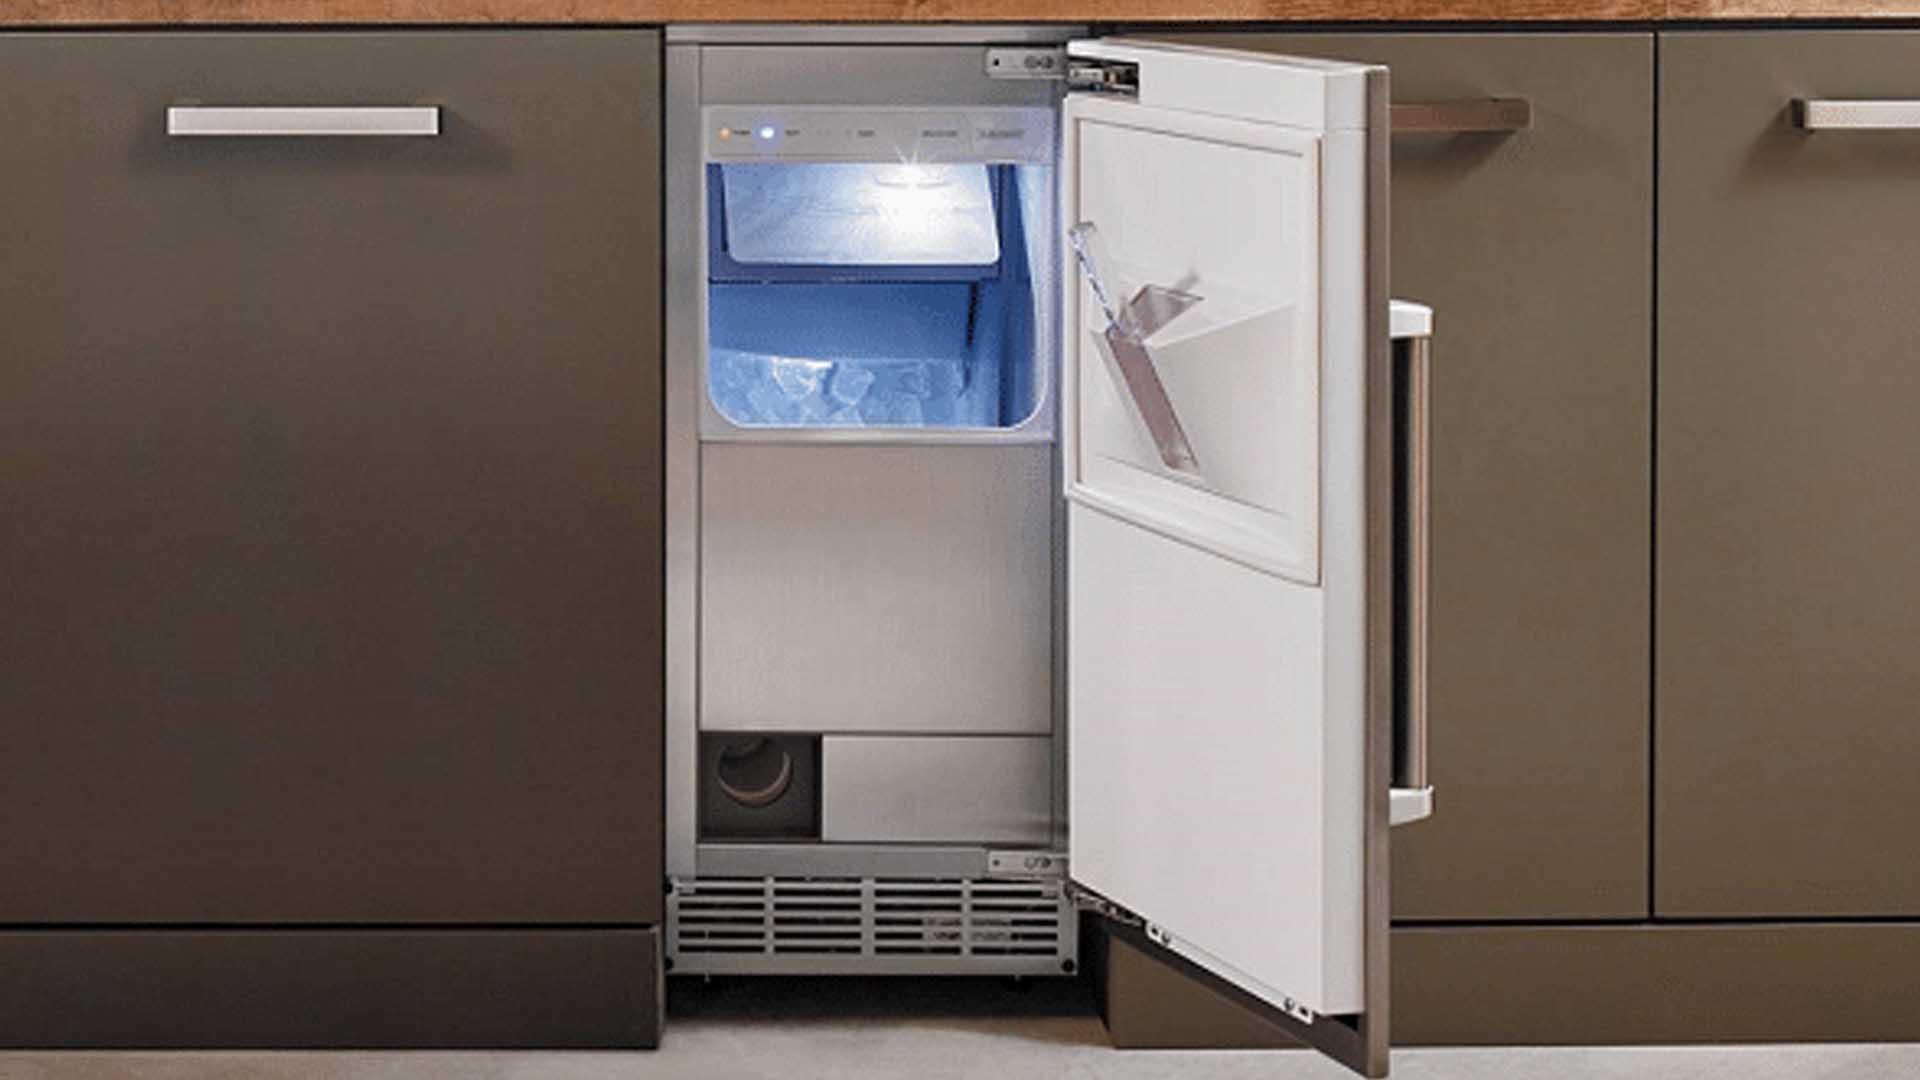 Viking Ice Maker Repair Service | Viking Appliance Repairs